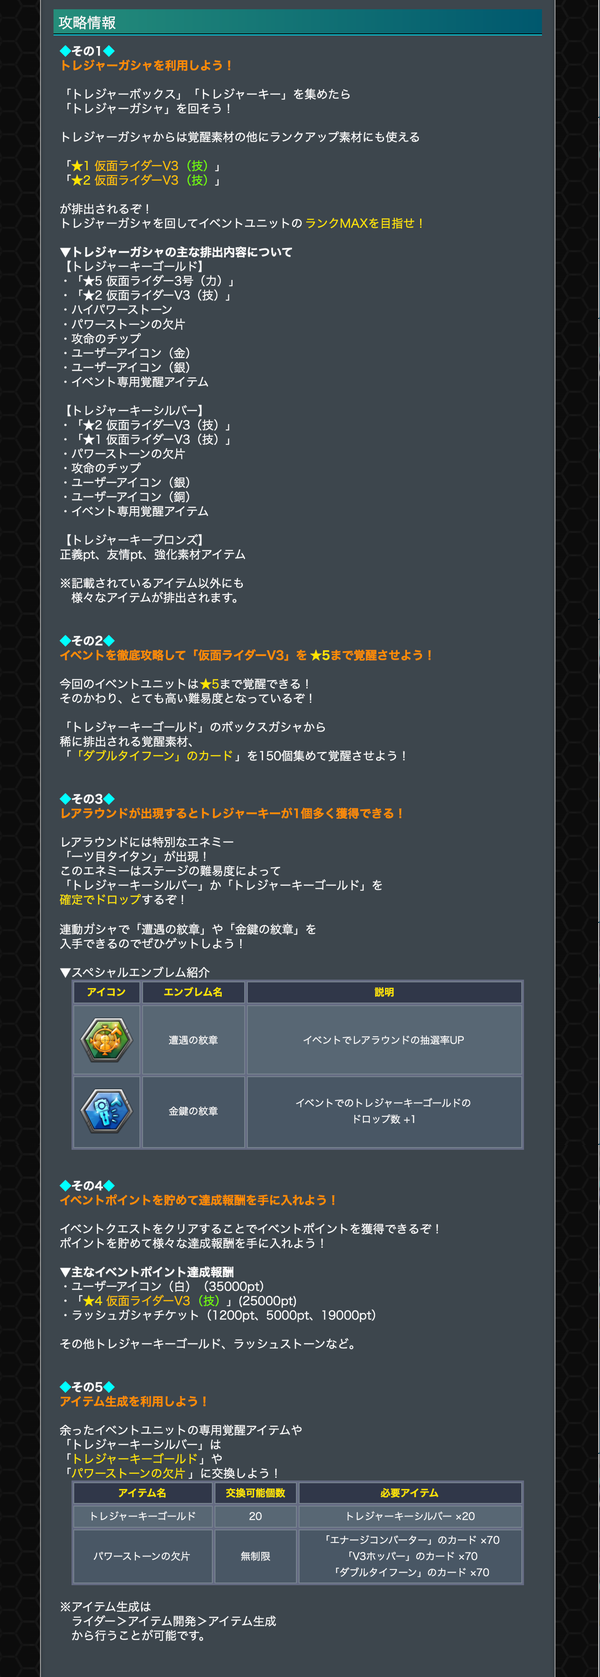 f:id:ich-ichi:20170220224025p:plain